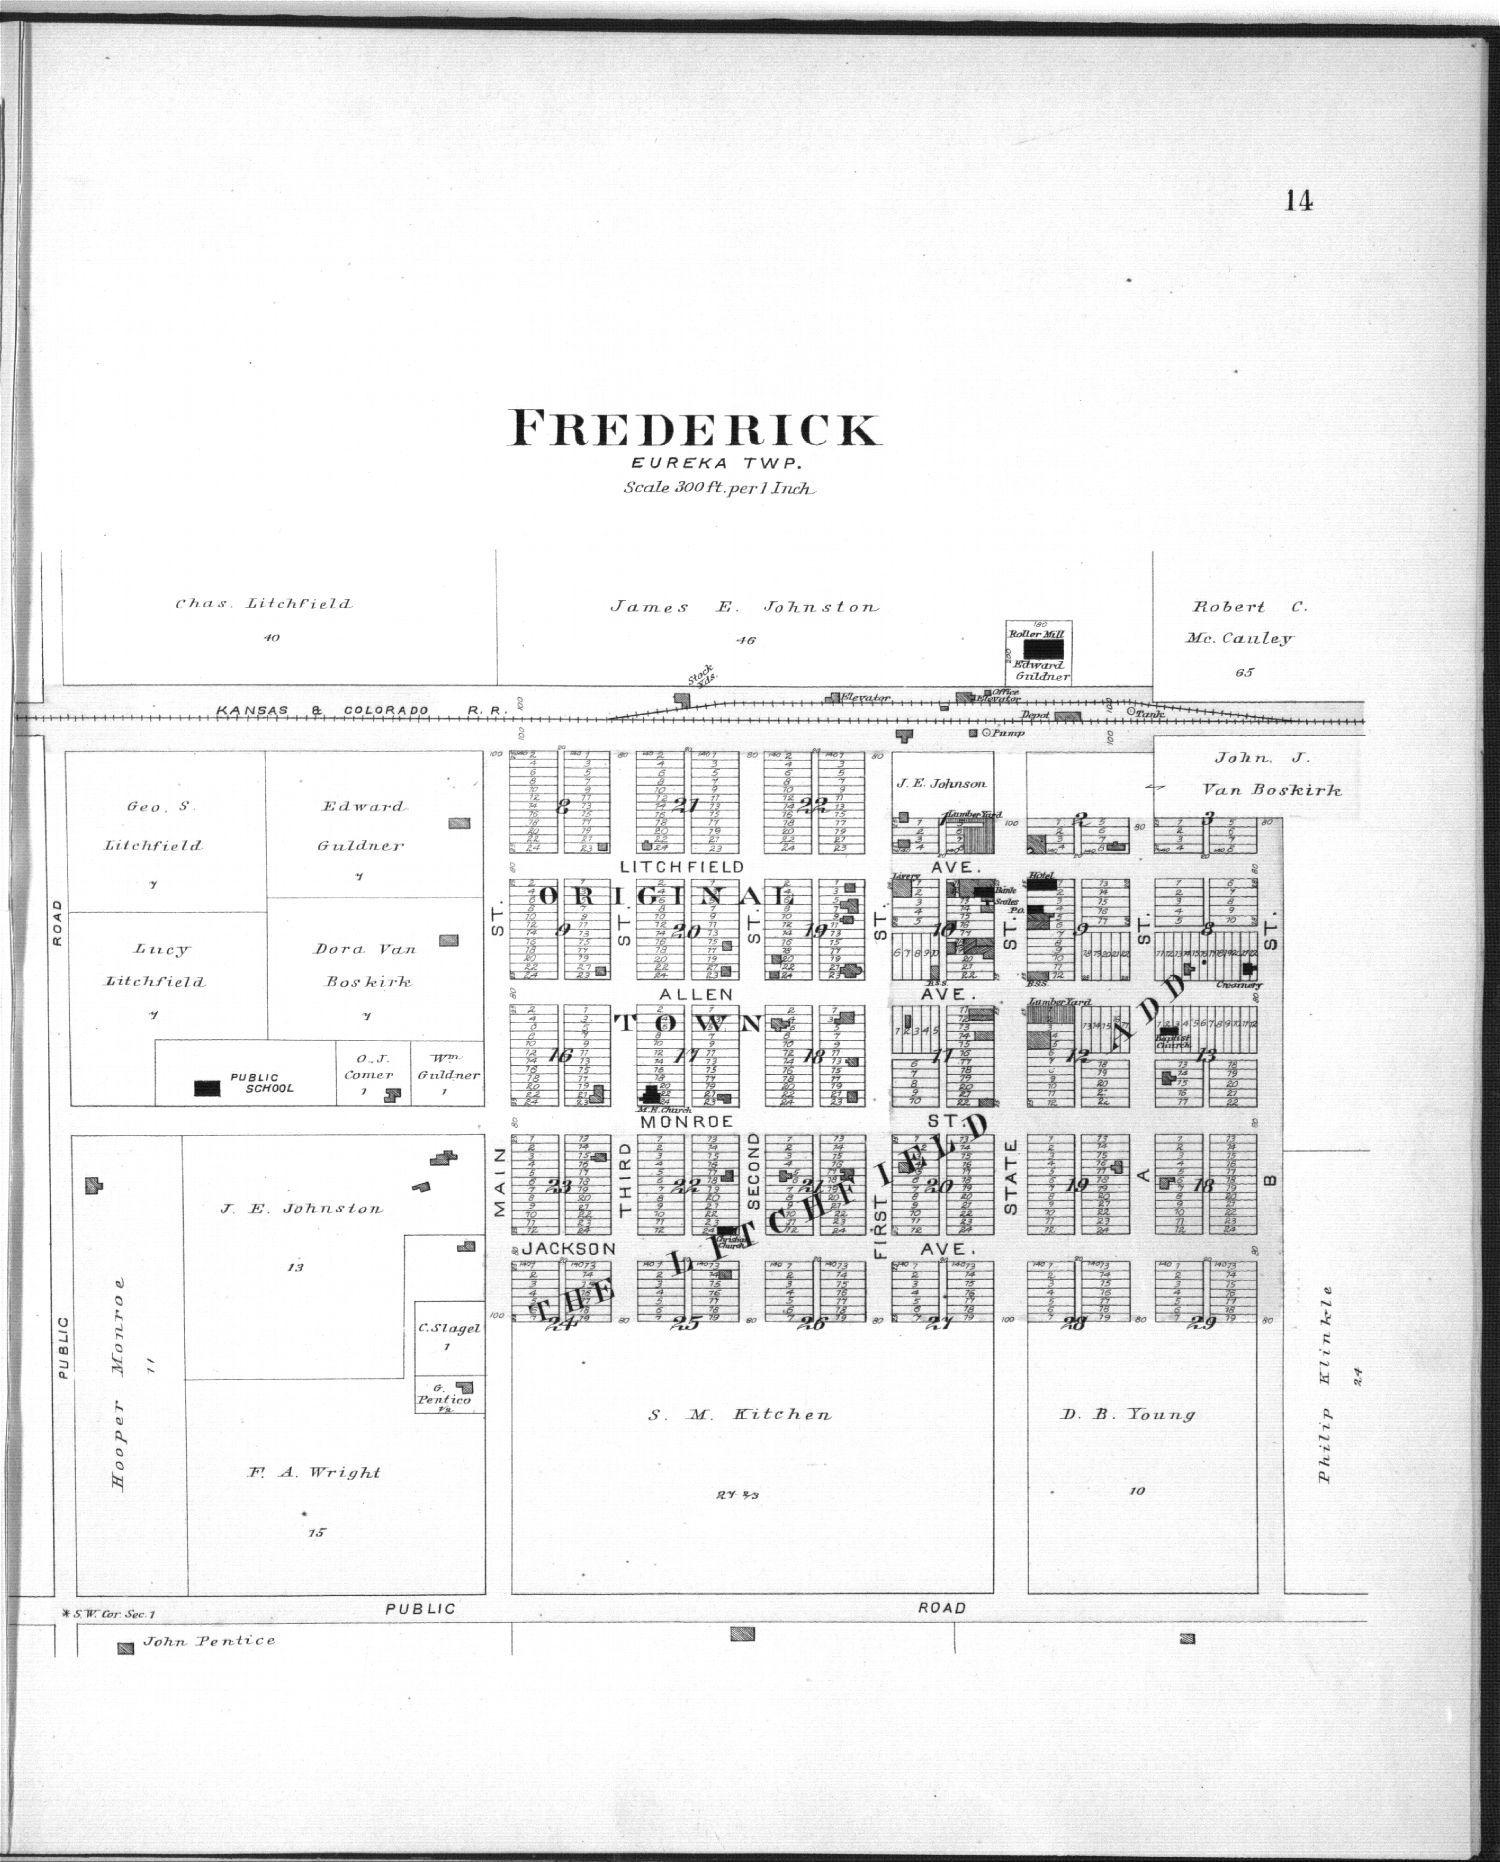 Plat book of Rice County, Kansas - 14